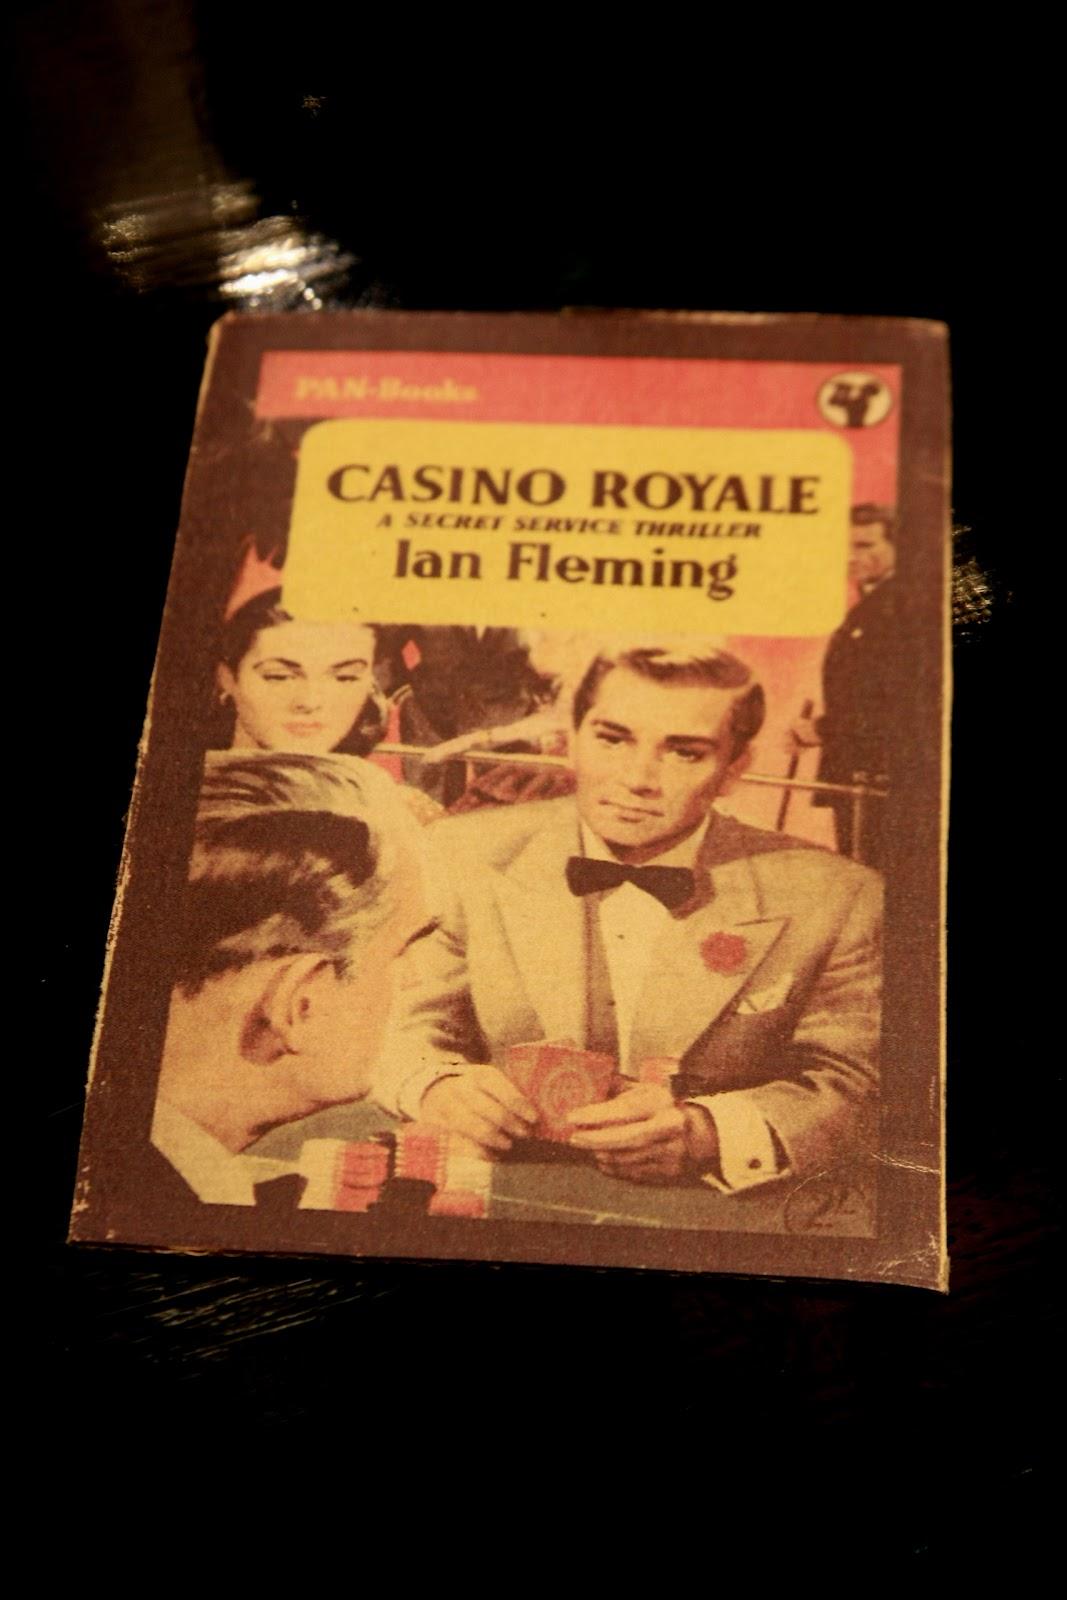 http://3.bp.blogspot.com/-h0J5MmLXWhw/UN1adgbQRbI/AAAAAAAACmA/Wmc-VbppSW8/s1600/casino%20royale%20vesper%20martini%20bar%20trench%202.JPG